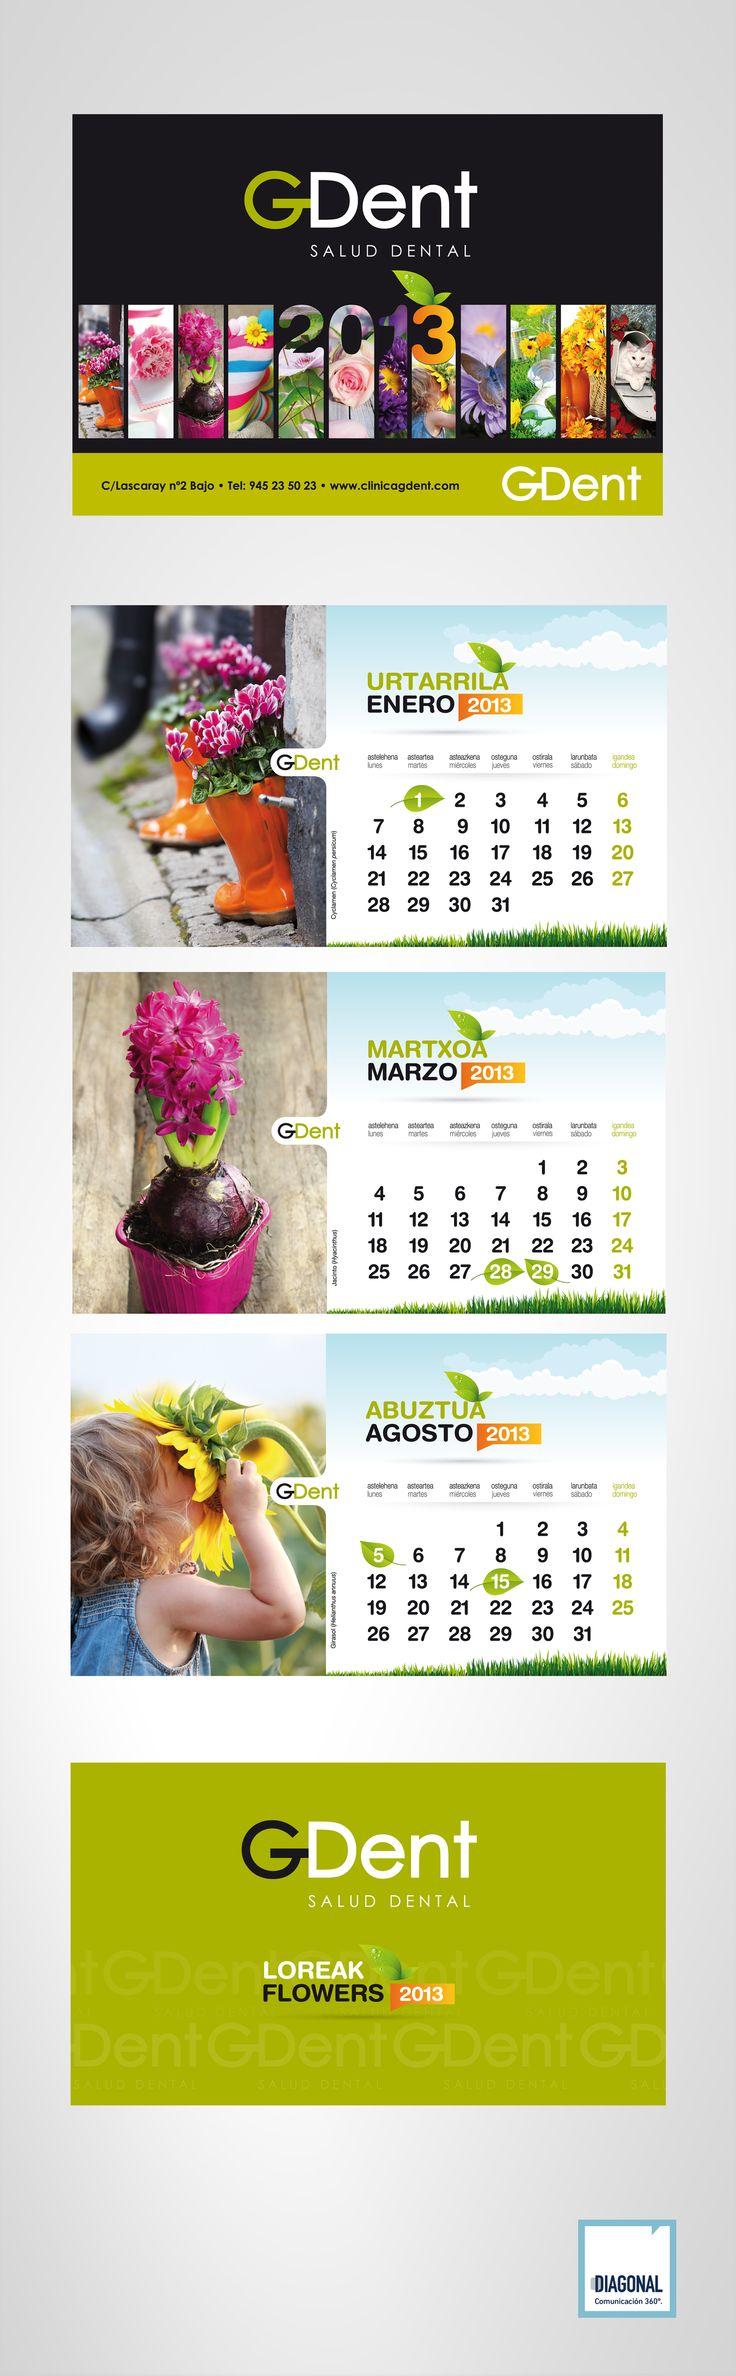 SALUD DENTAL GDent Calendario de mesa